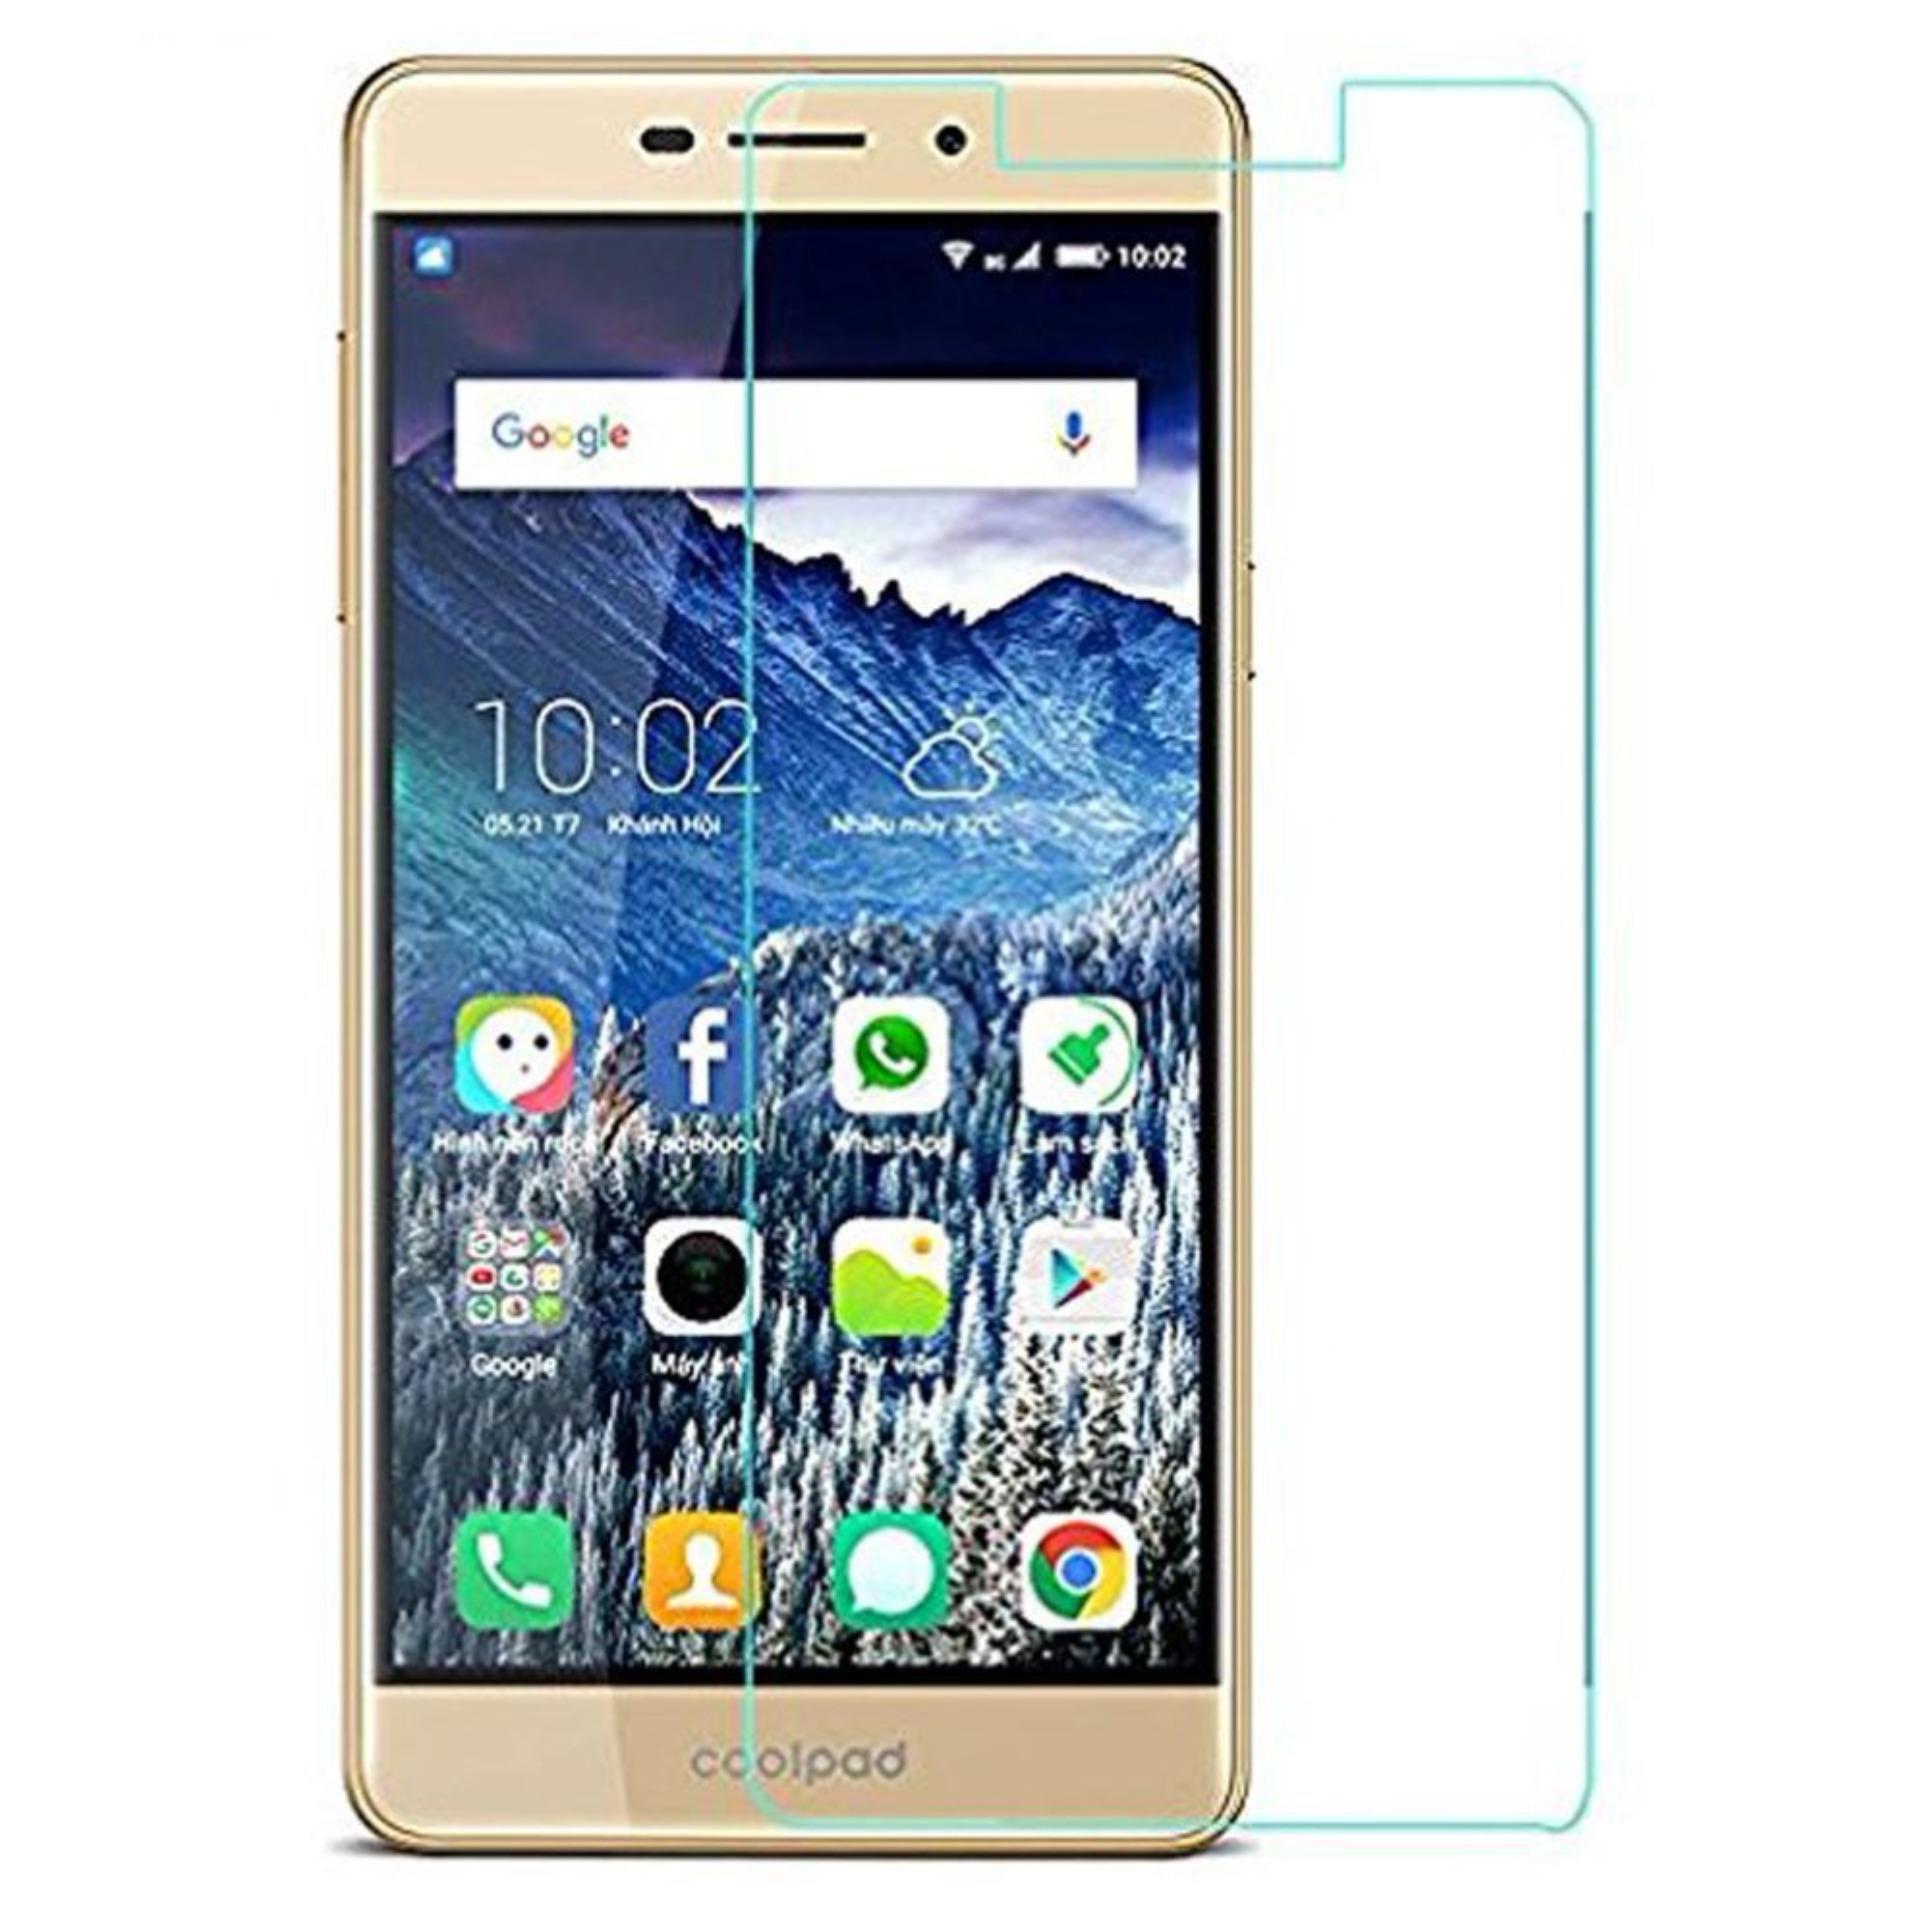 Vn CoolPad Mega Tempered Glass 9H Screen Protector 0.32mm - Transparan